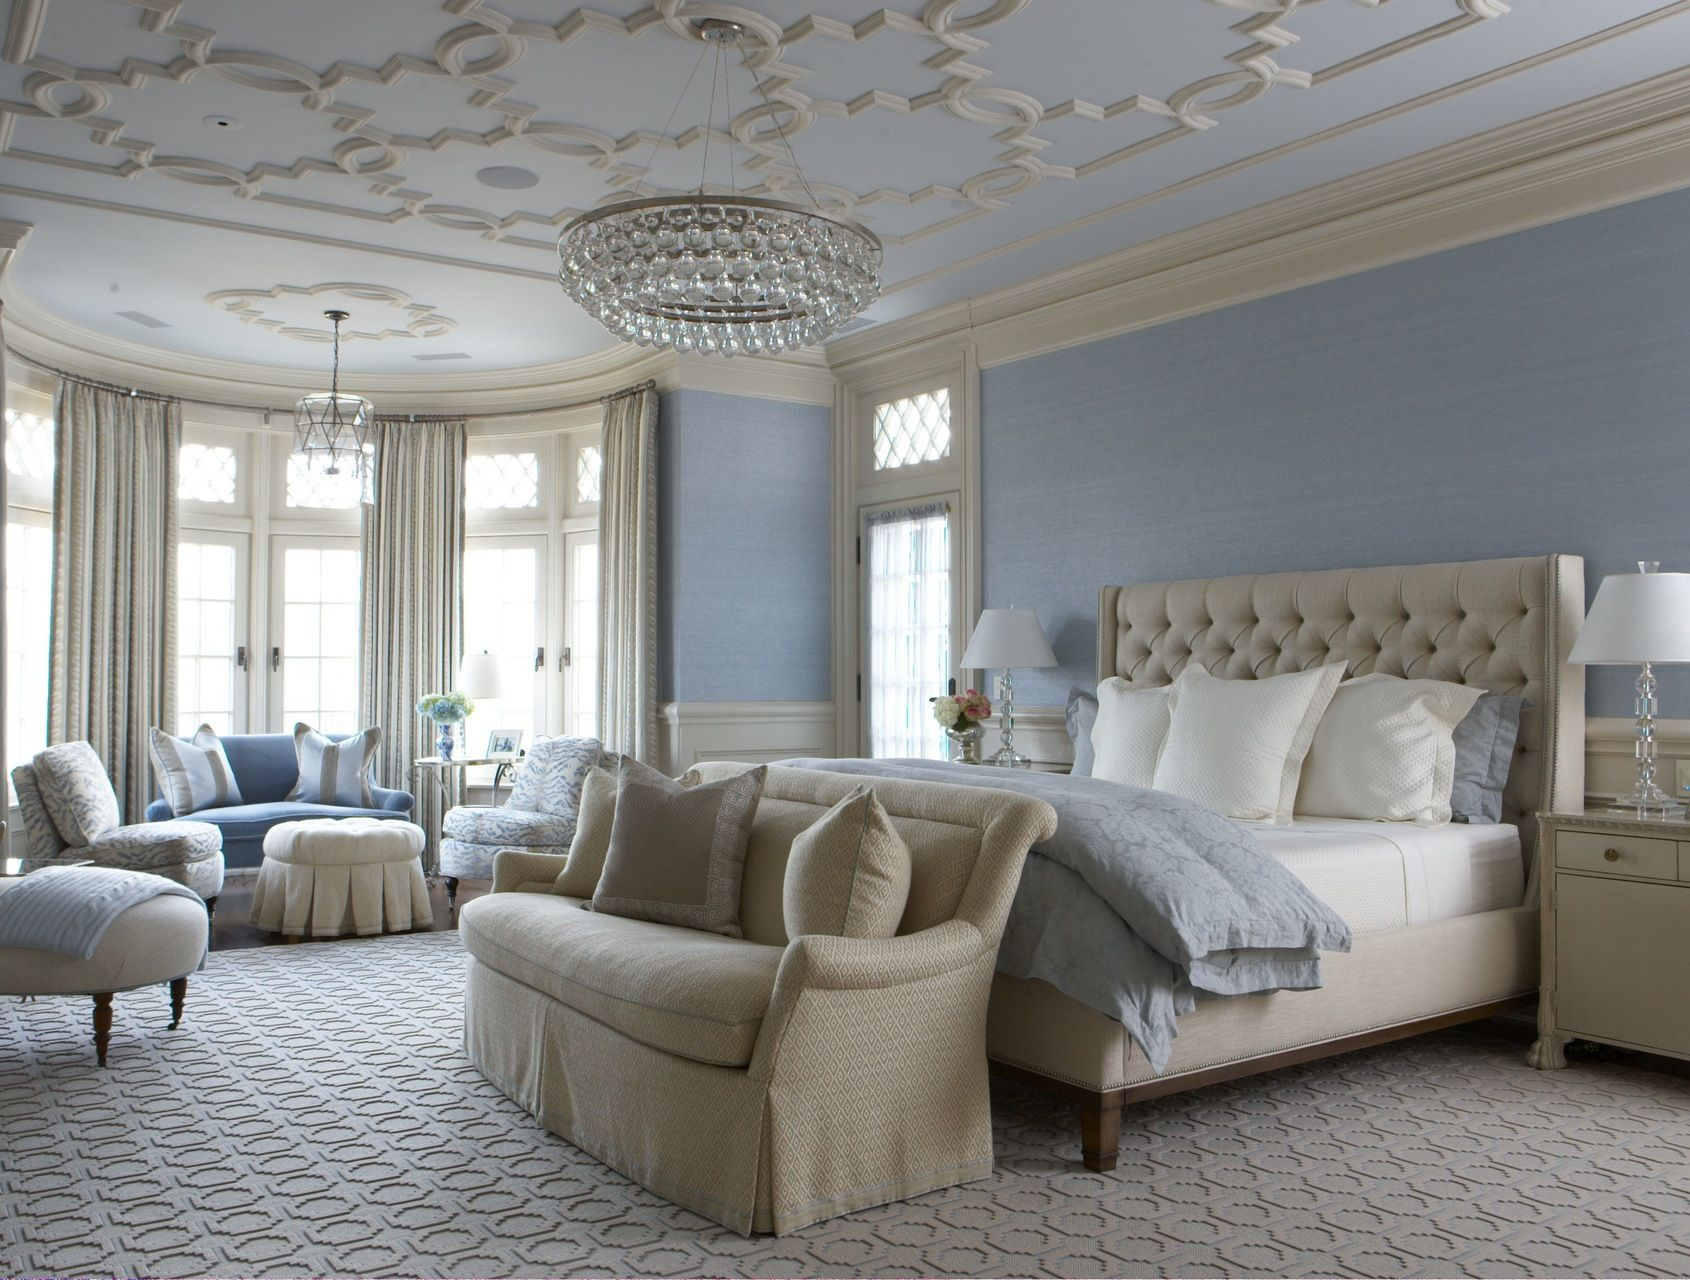 Rinfret limited interior design decoration llc portfolio interiors styles.jpg?ixlib=rails 1.1